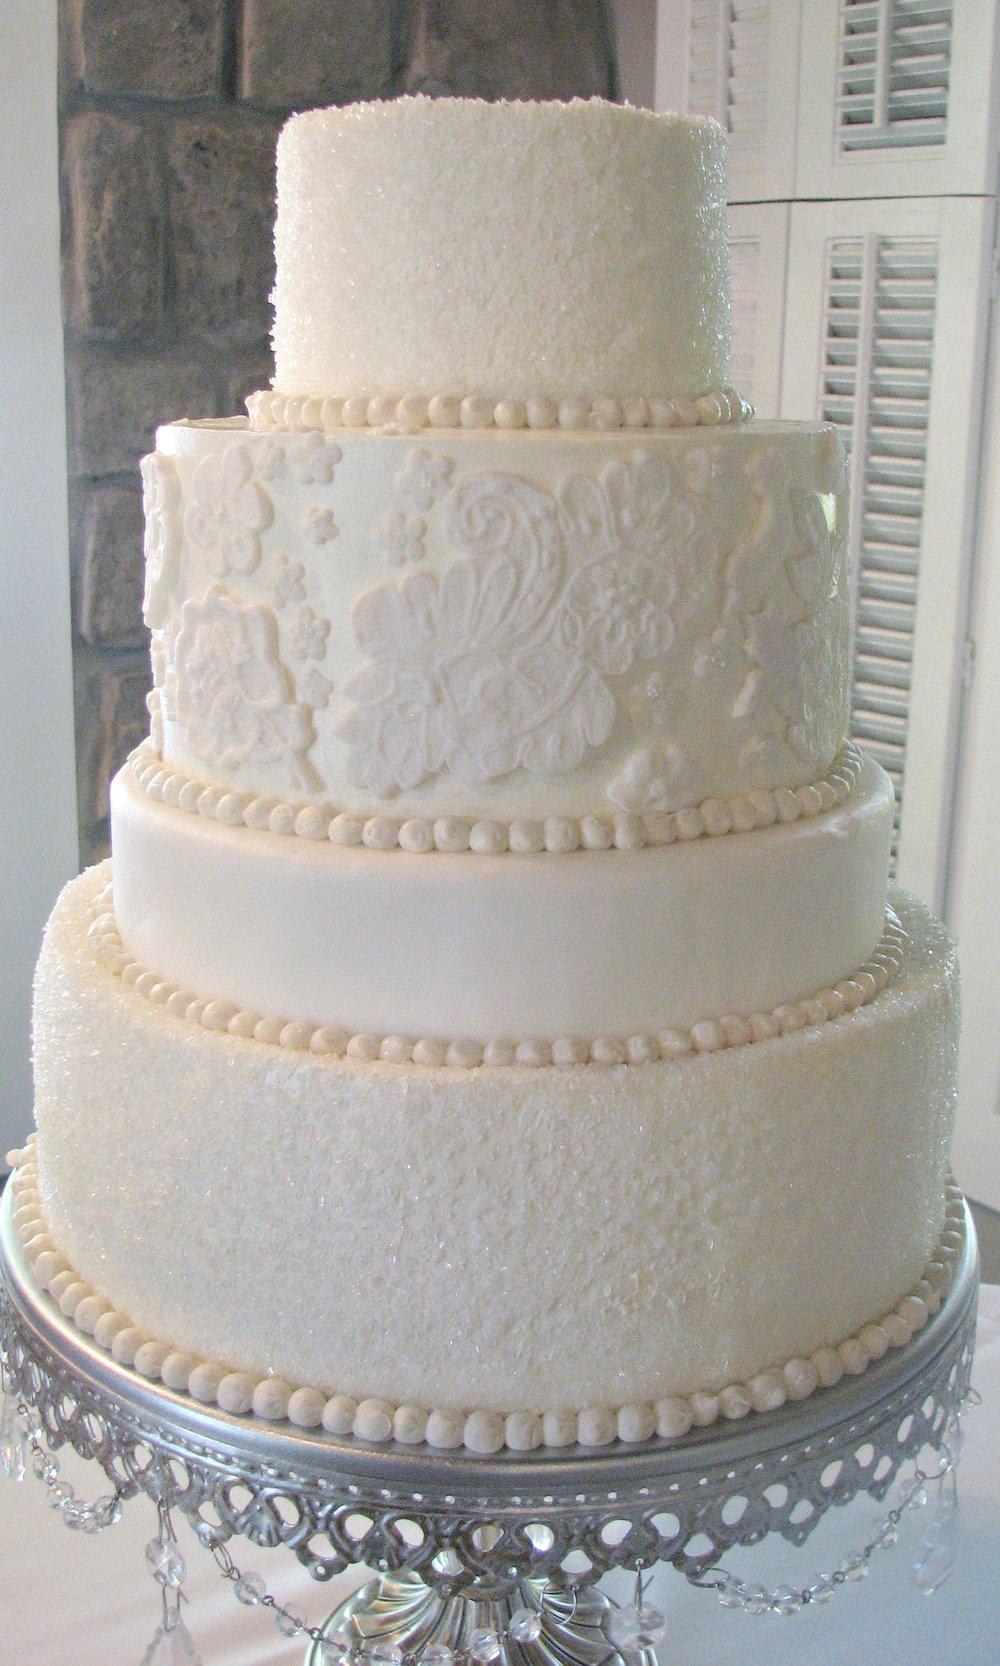 white-weddingcake-silver-cake-stand.jpg